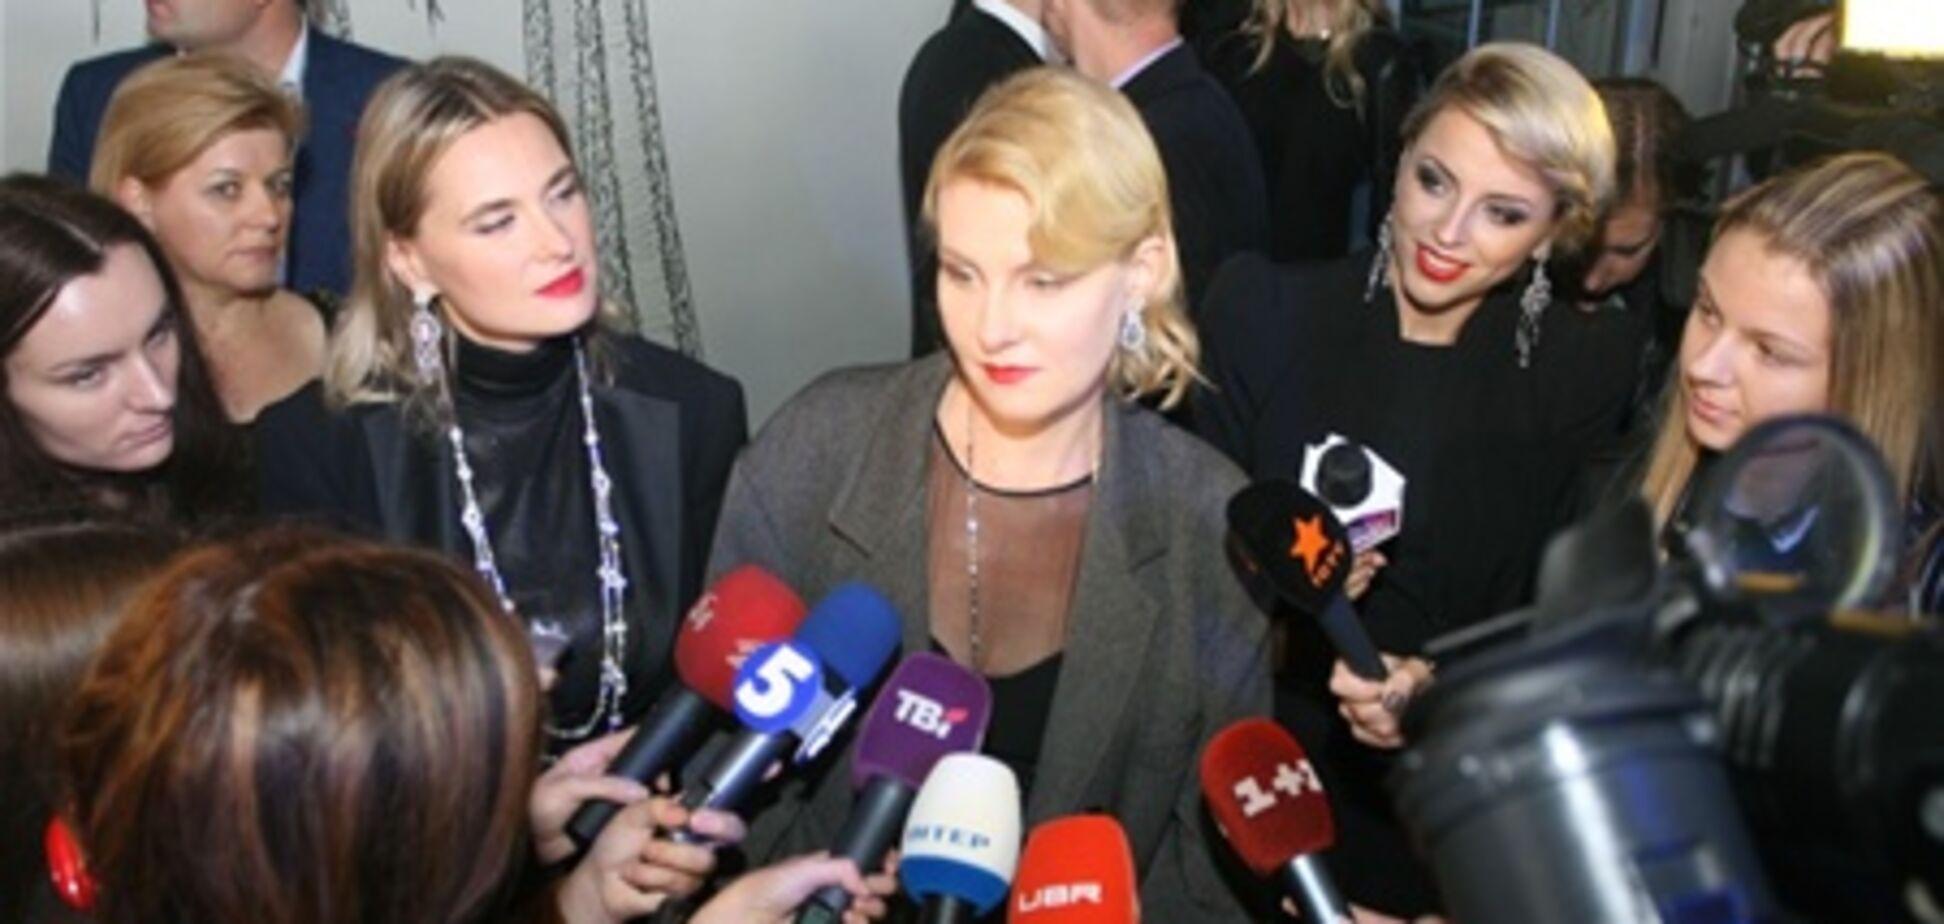 Звезды и политики упивались виски на модном показе